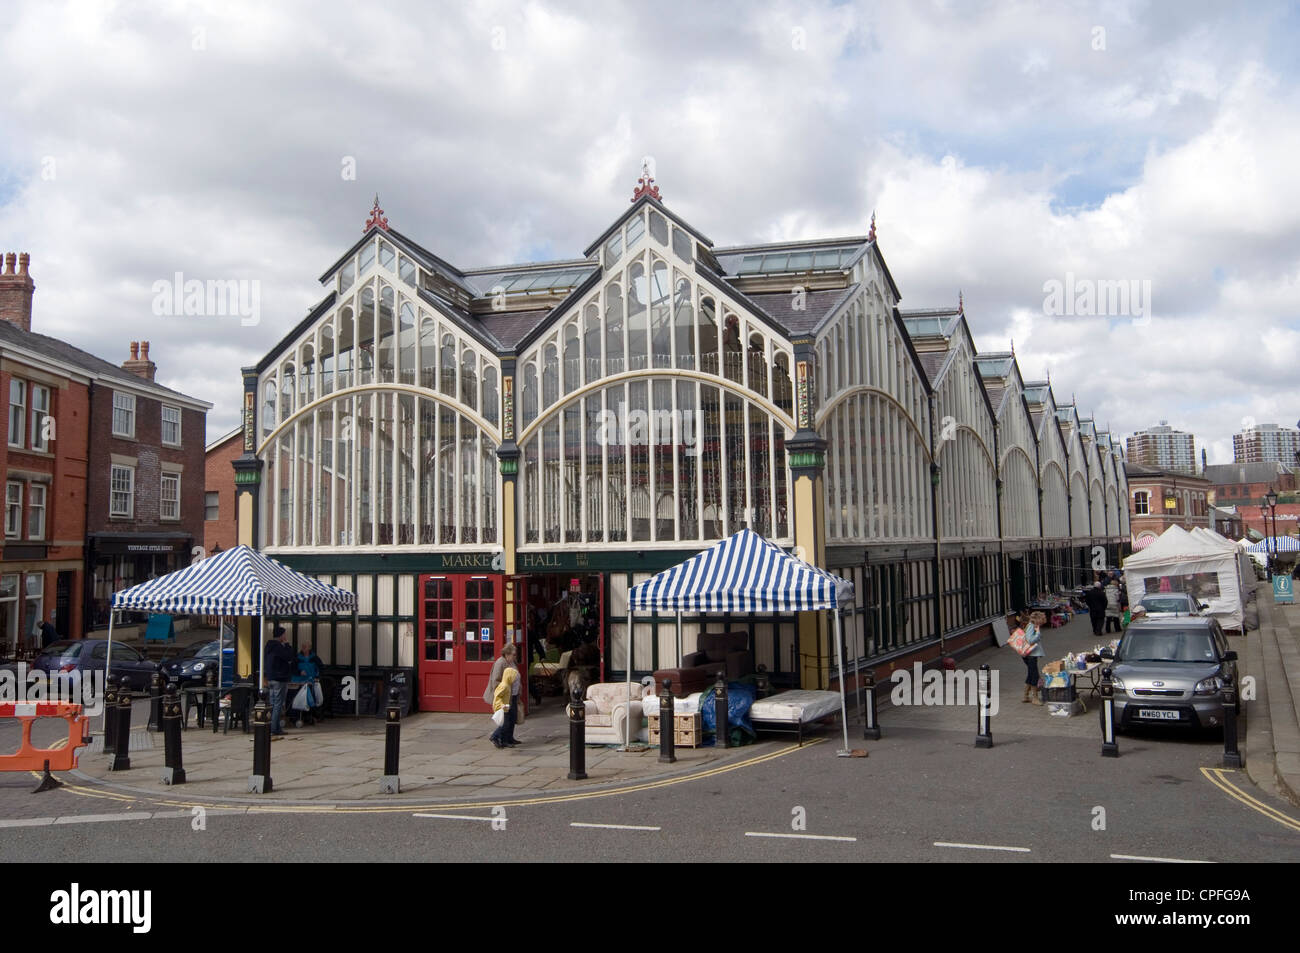 Stockport indoor market uk glass Victorian buliding - Stock Image